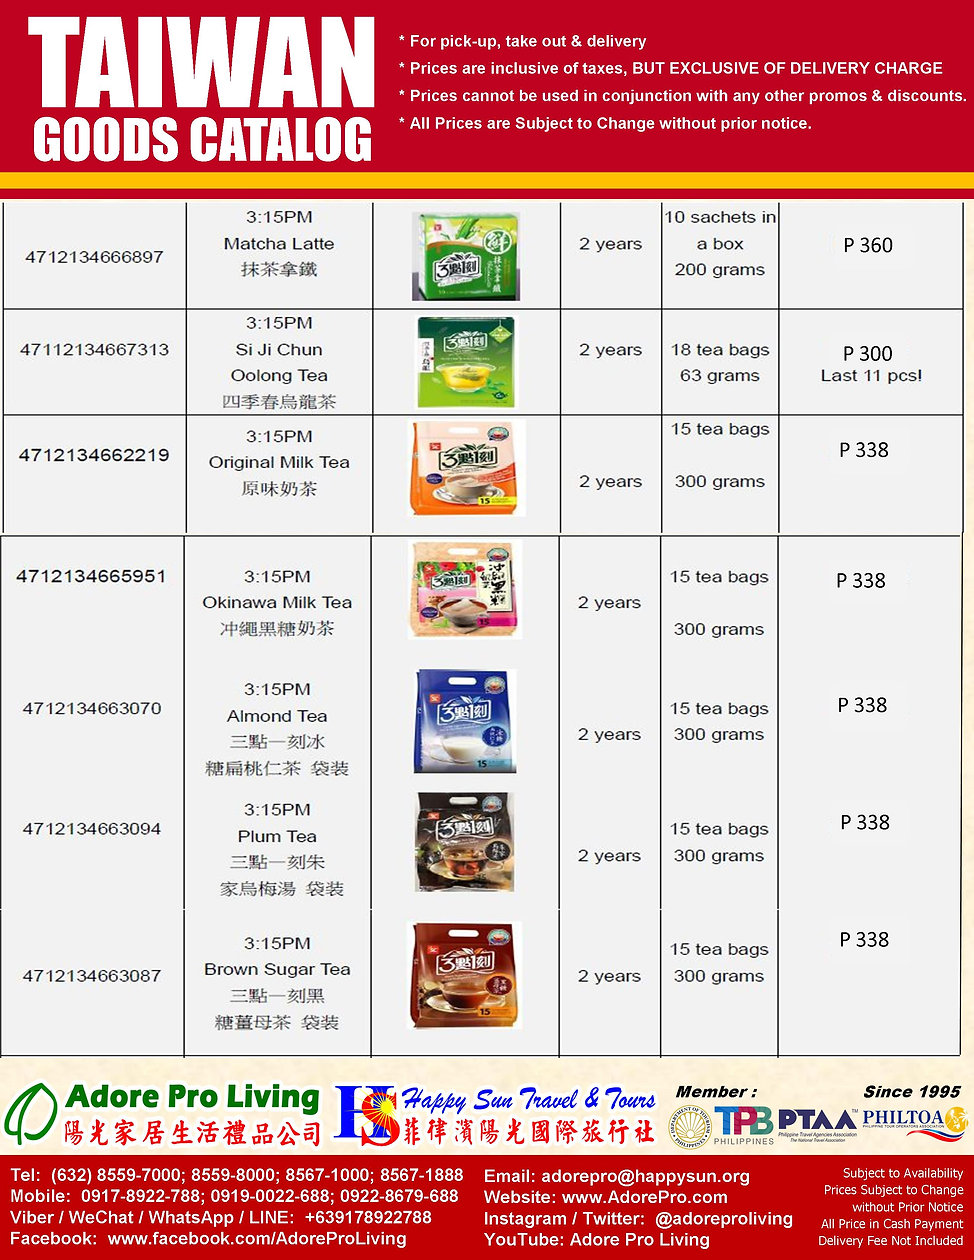 P1_Taiwan Goods Catalog_202009119.jpg